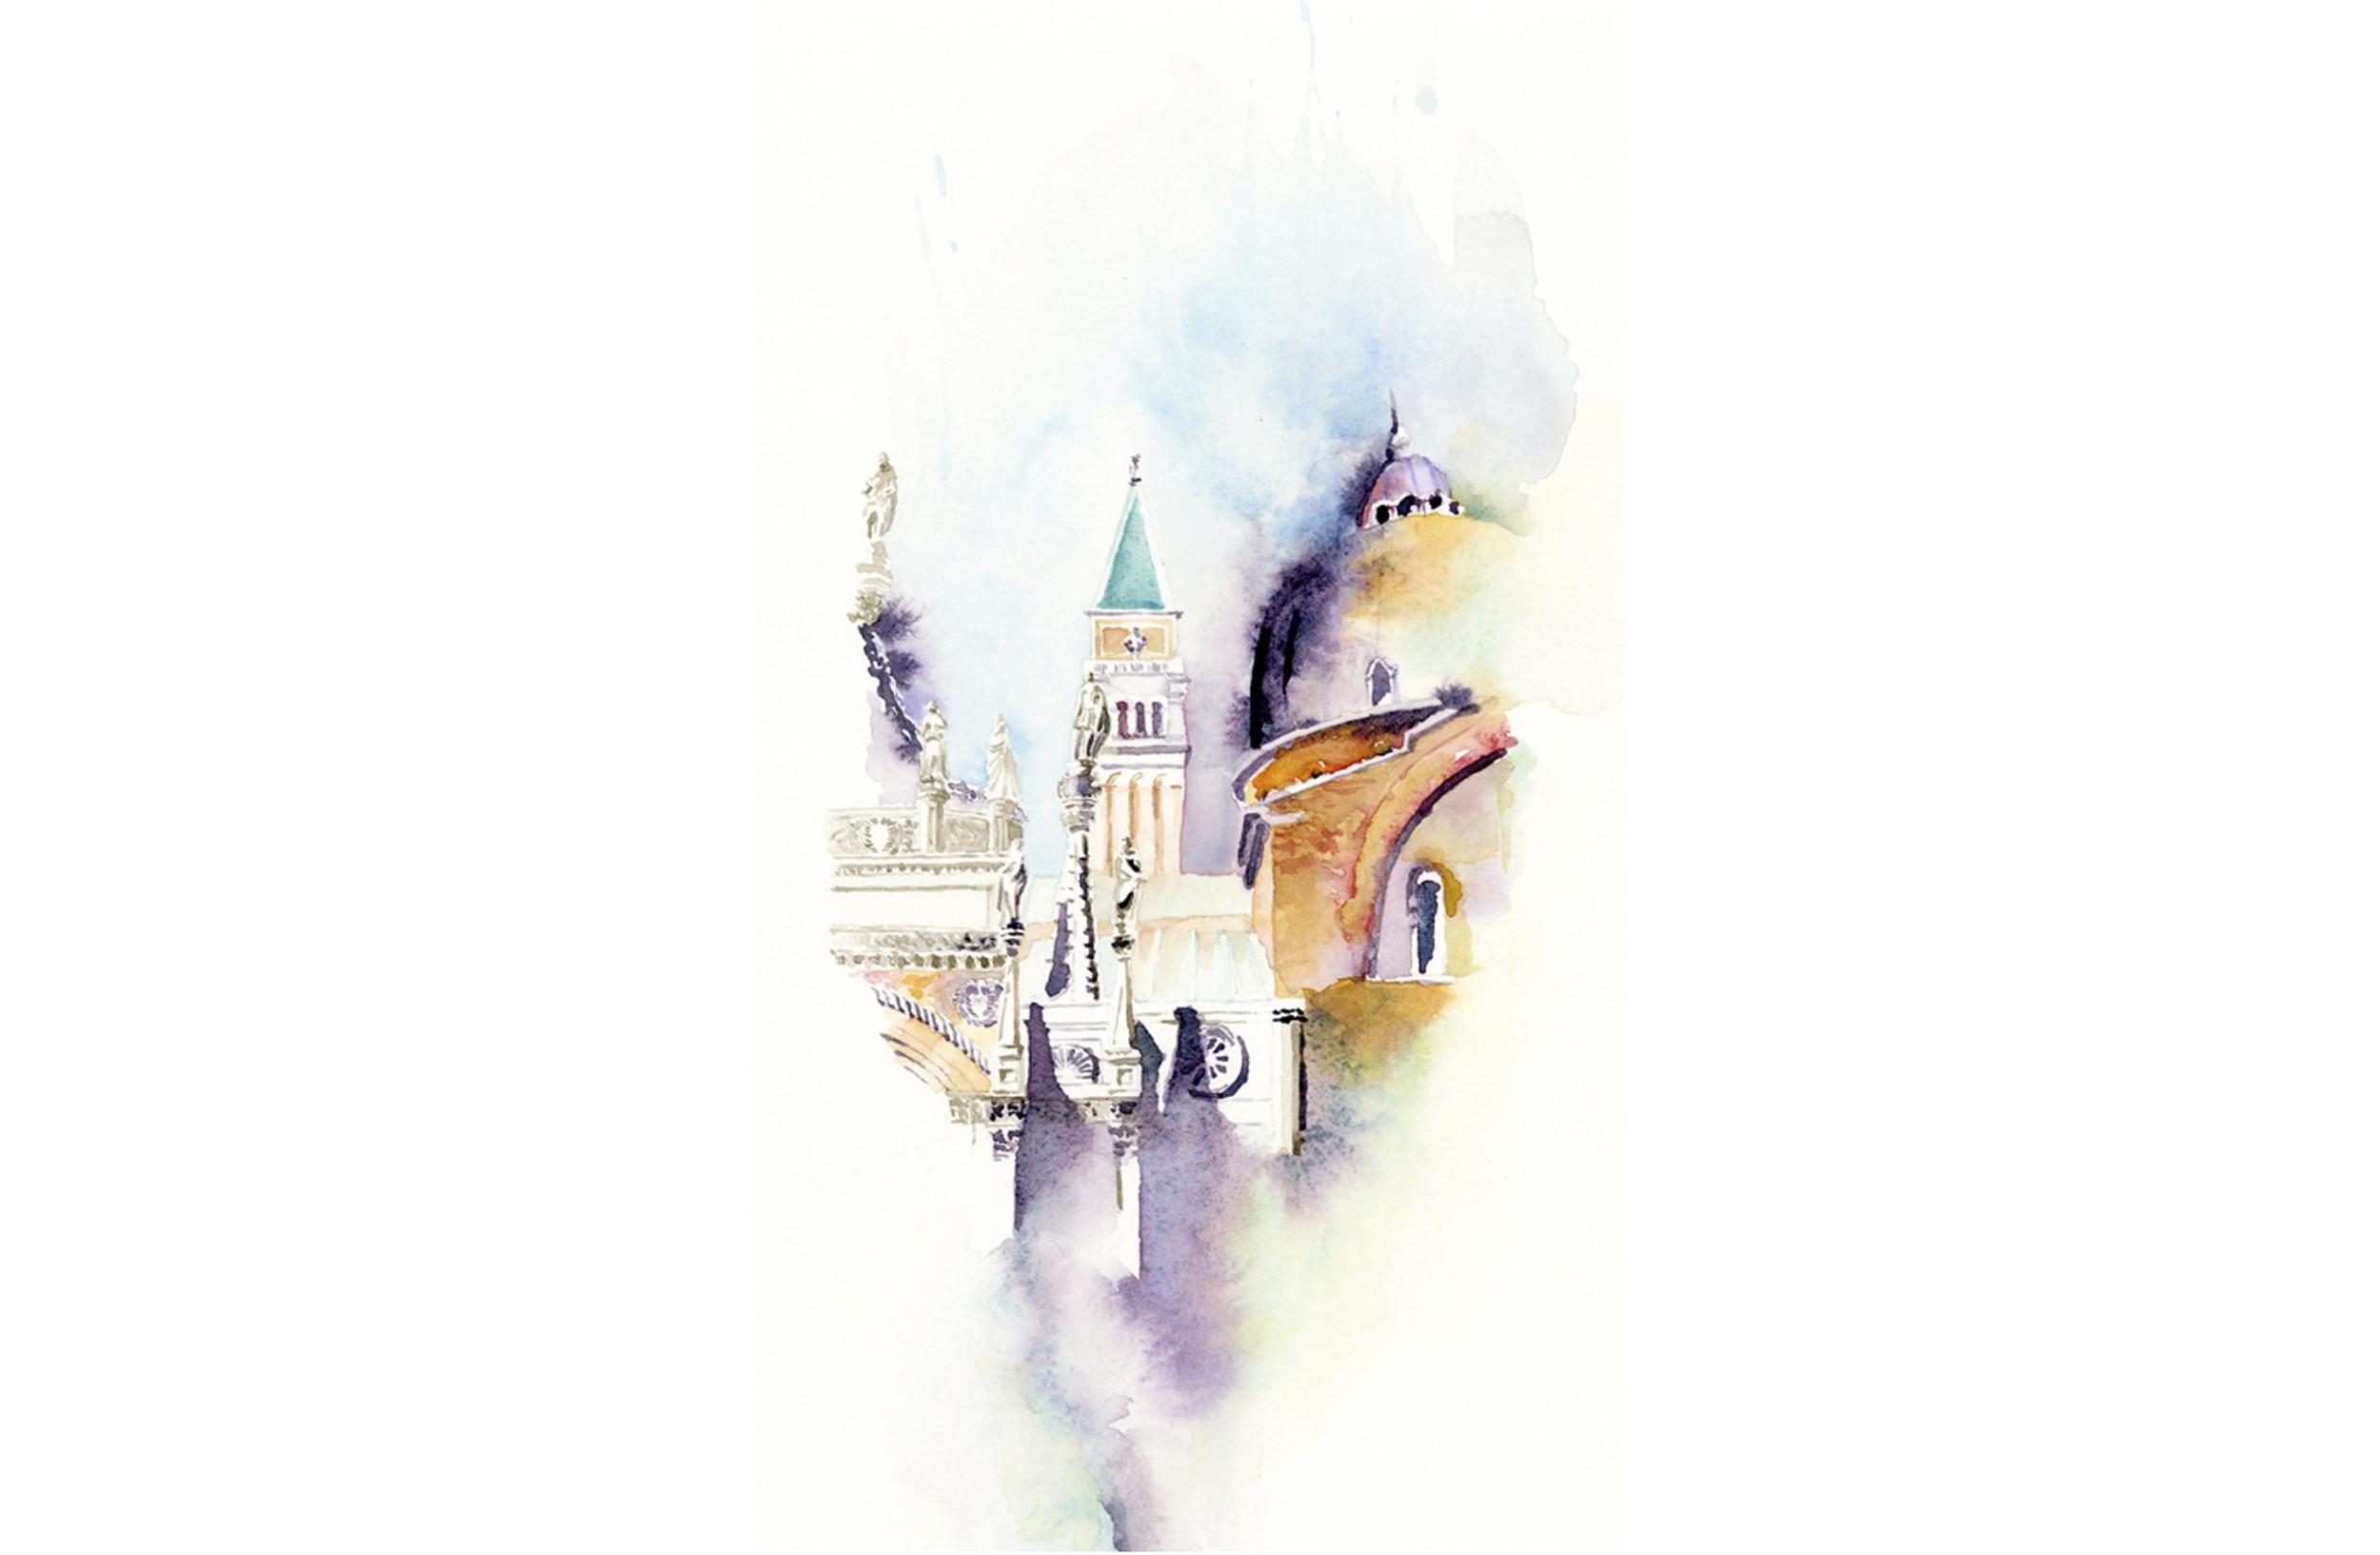 venetian-vista-watercolor-sant-marks-doges-palace-copyright-sophia-khan.jpg